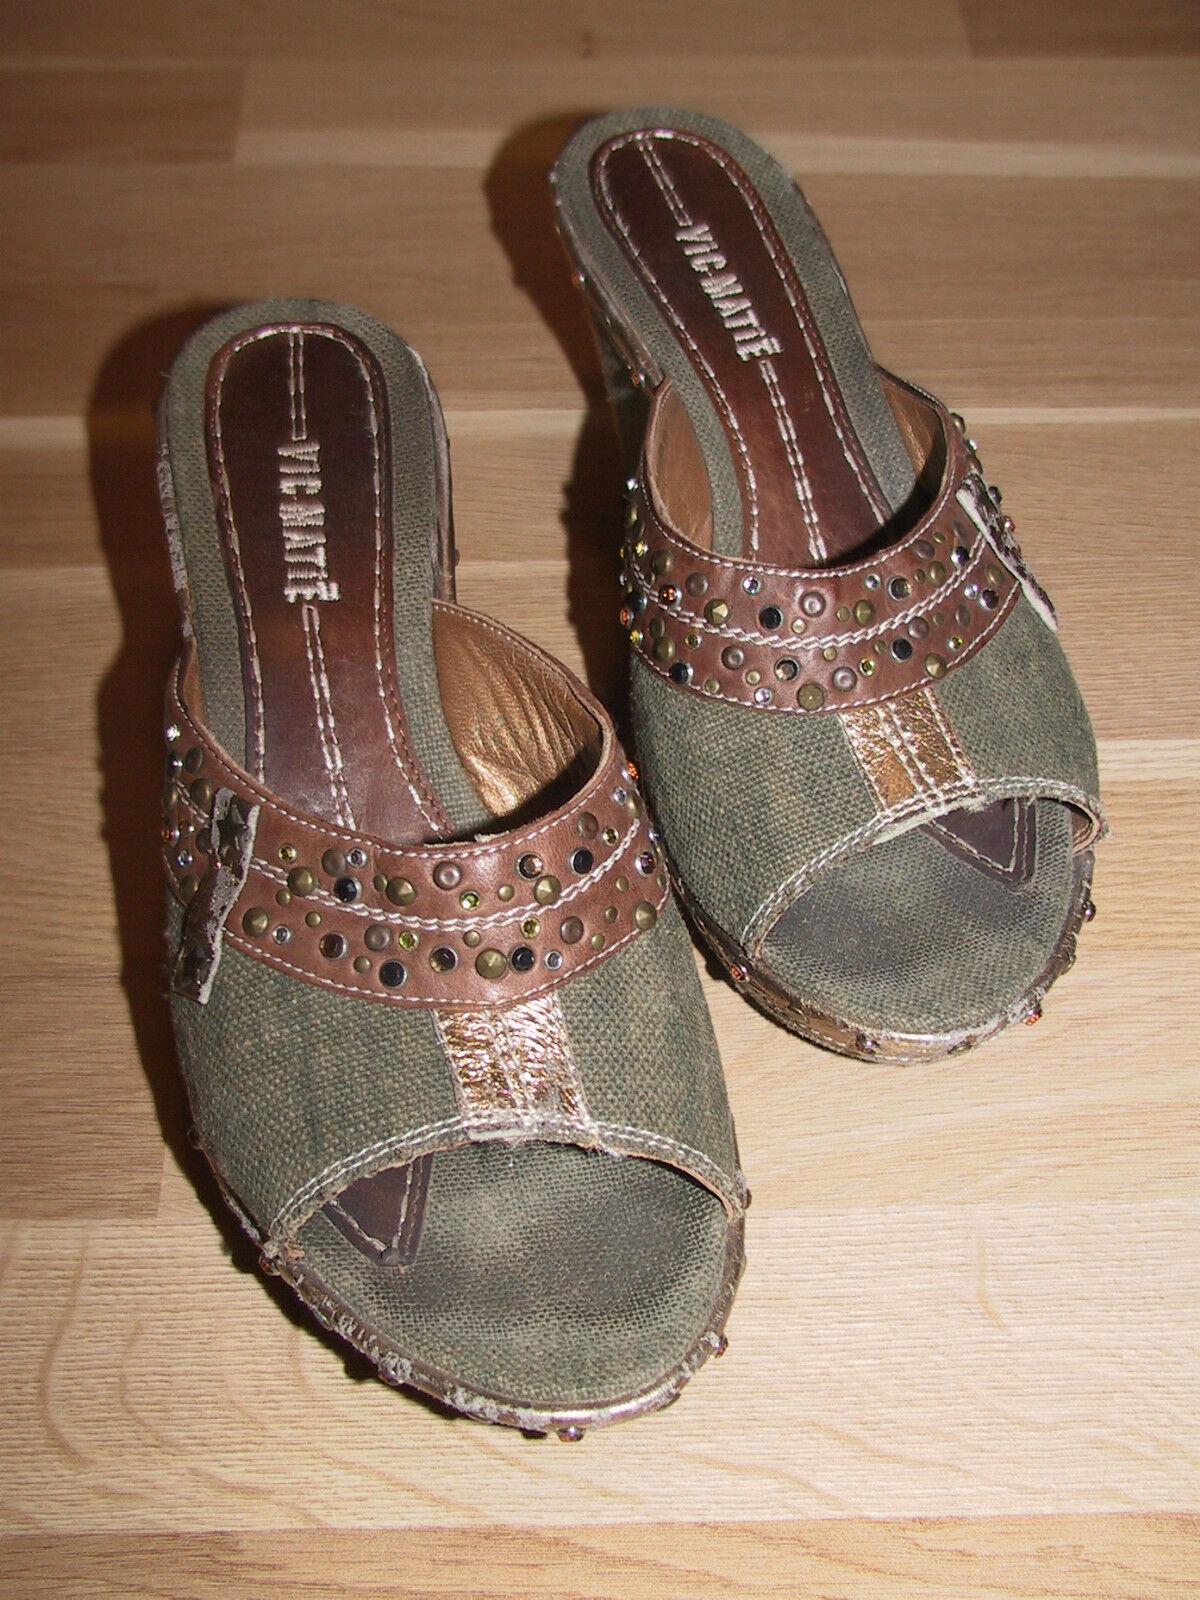 VIC MATIE Wedges Keil Sandale Pumps grün braun Gr 39 Strass Leder Textil schöön